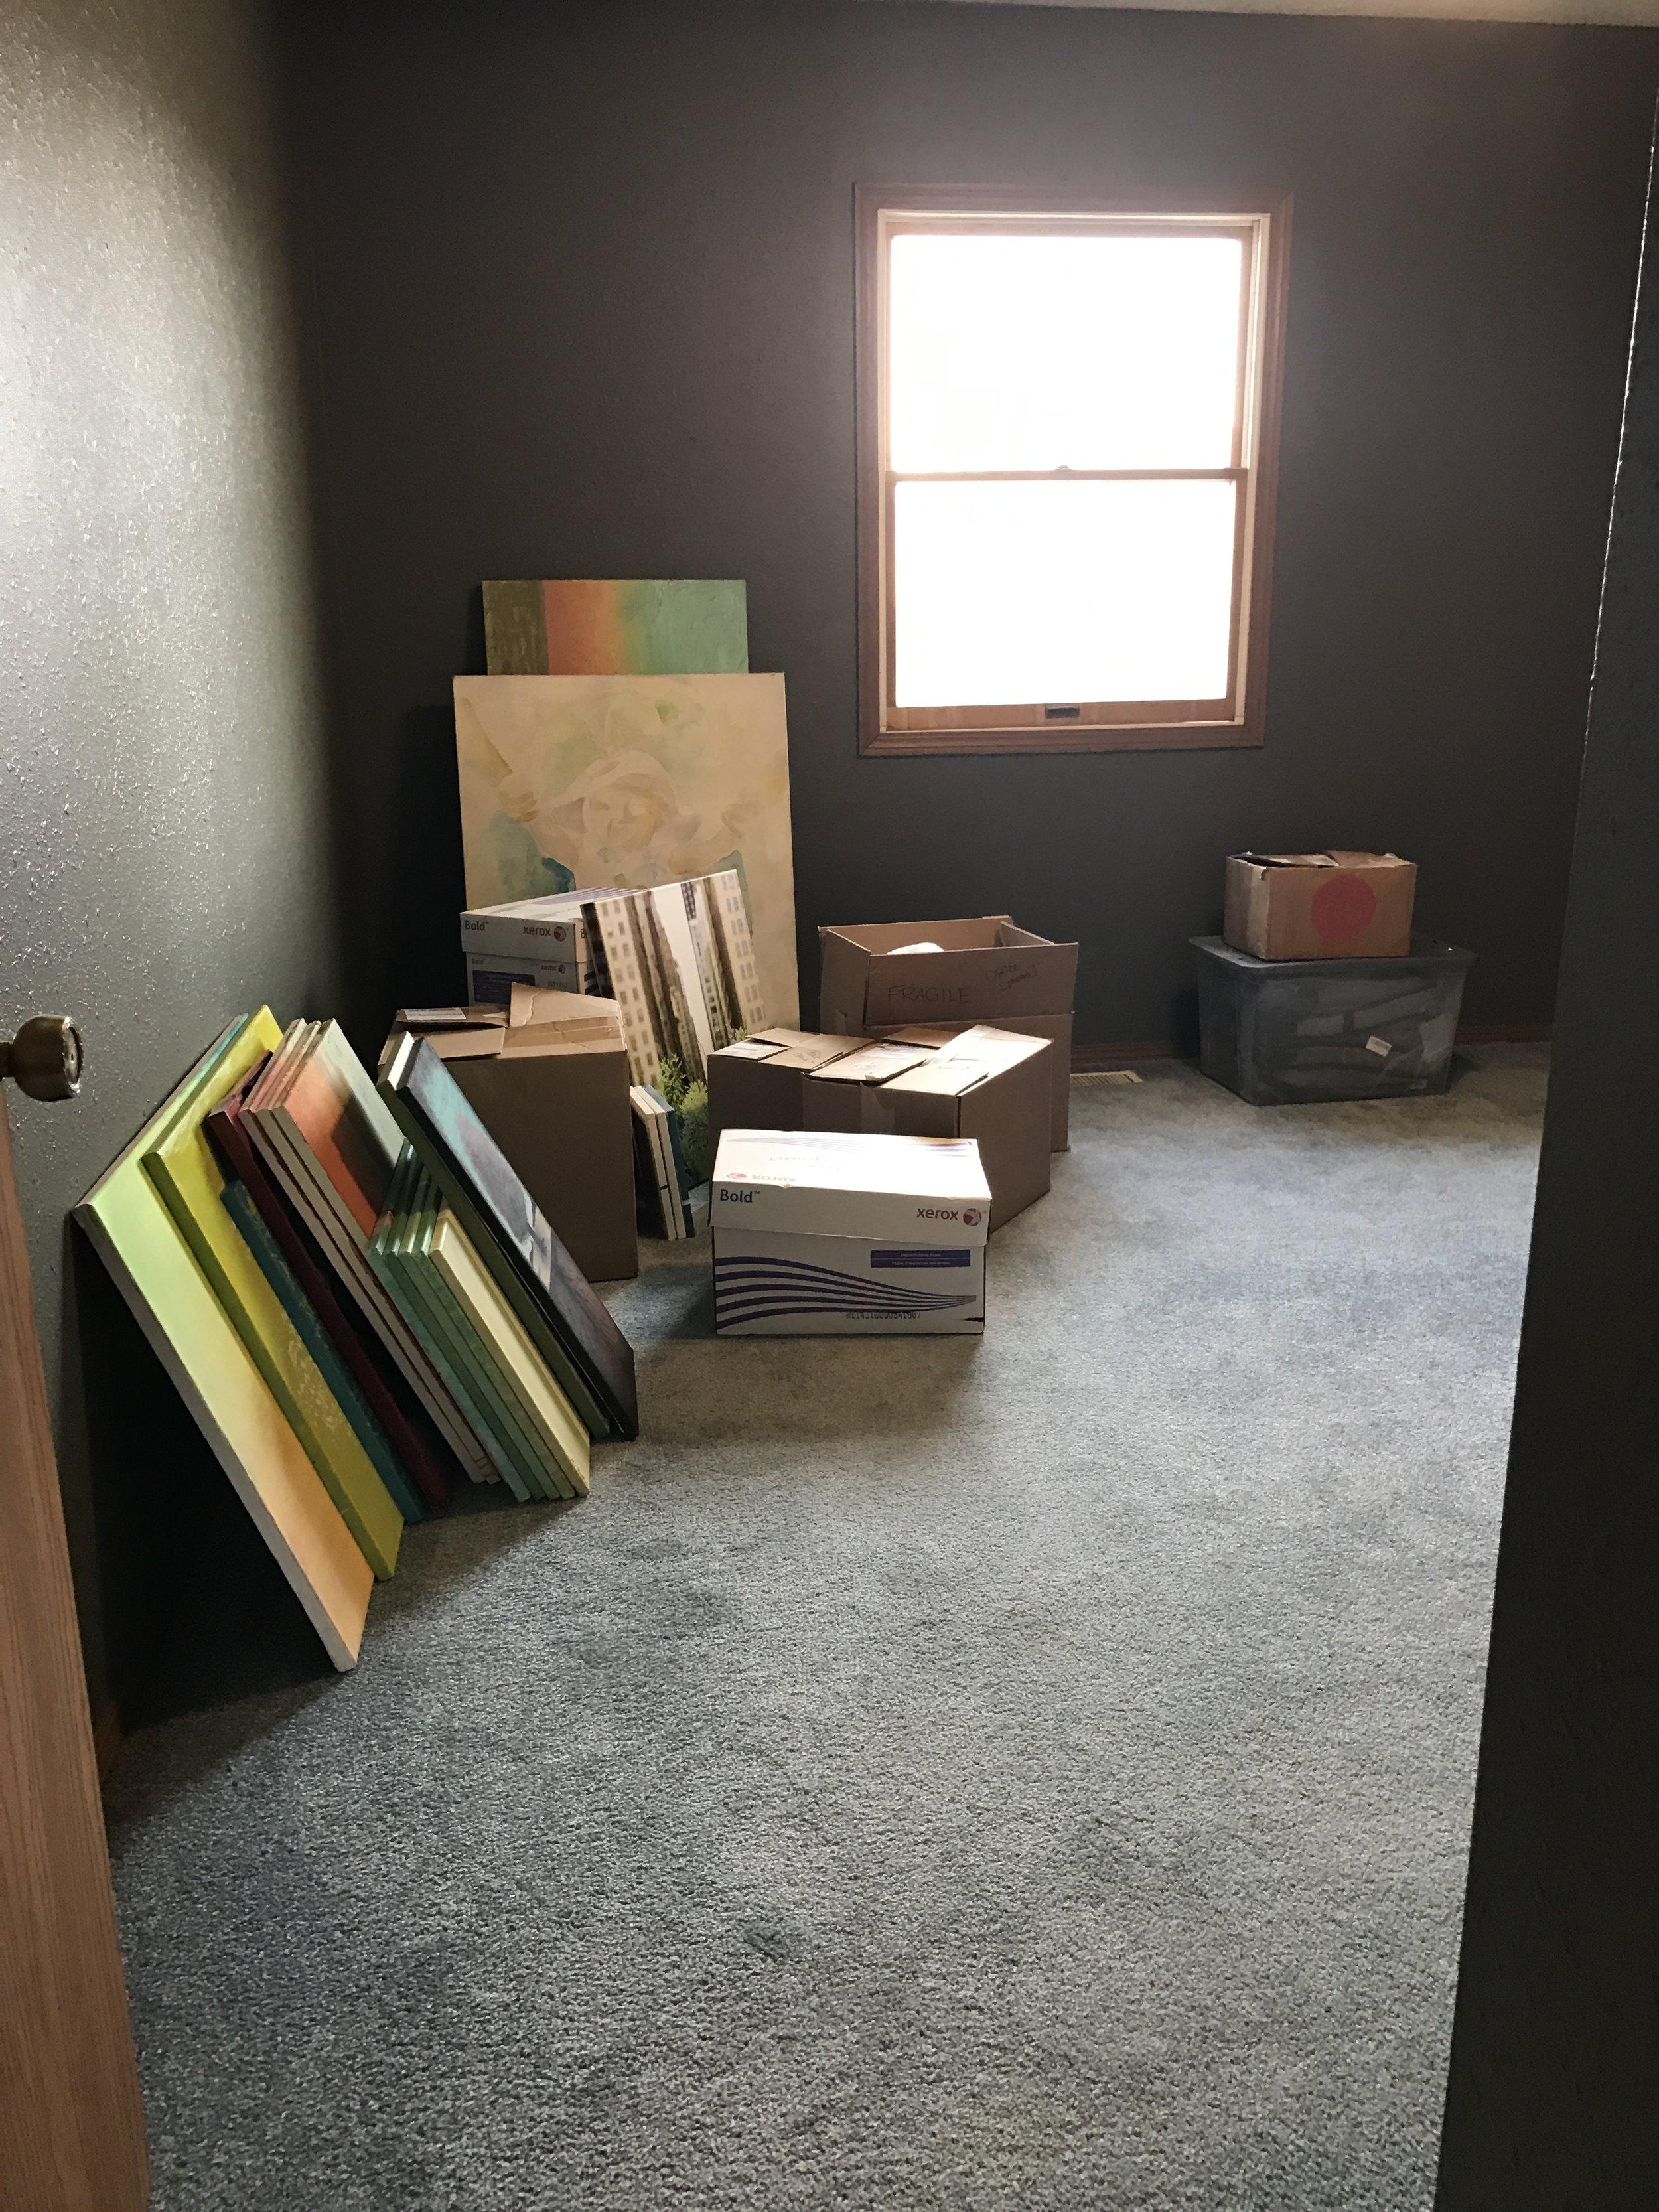 Missy_Robbs_GDP_Home_Office_Boxes.JPG